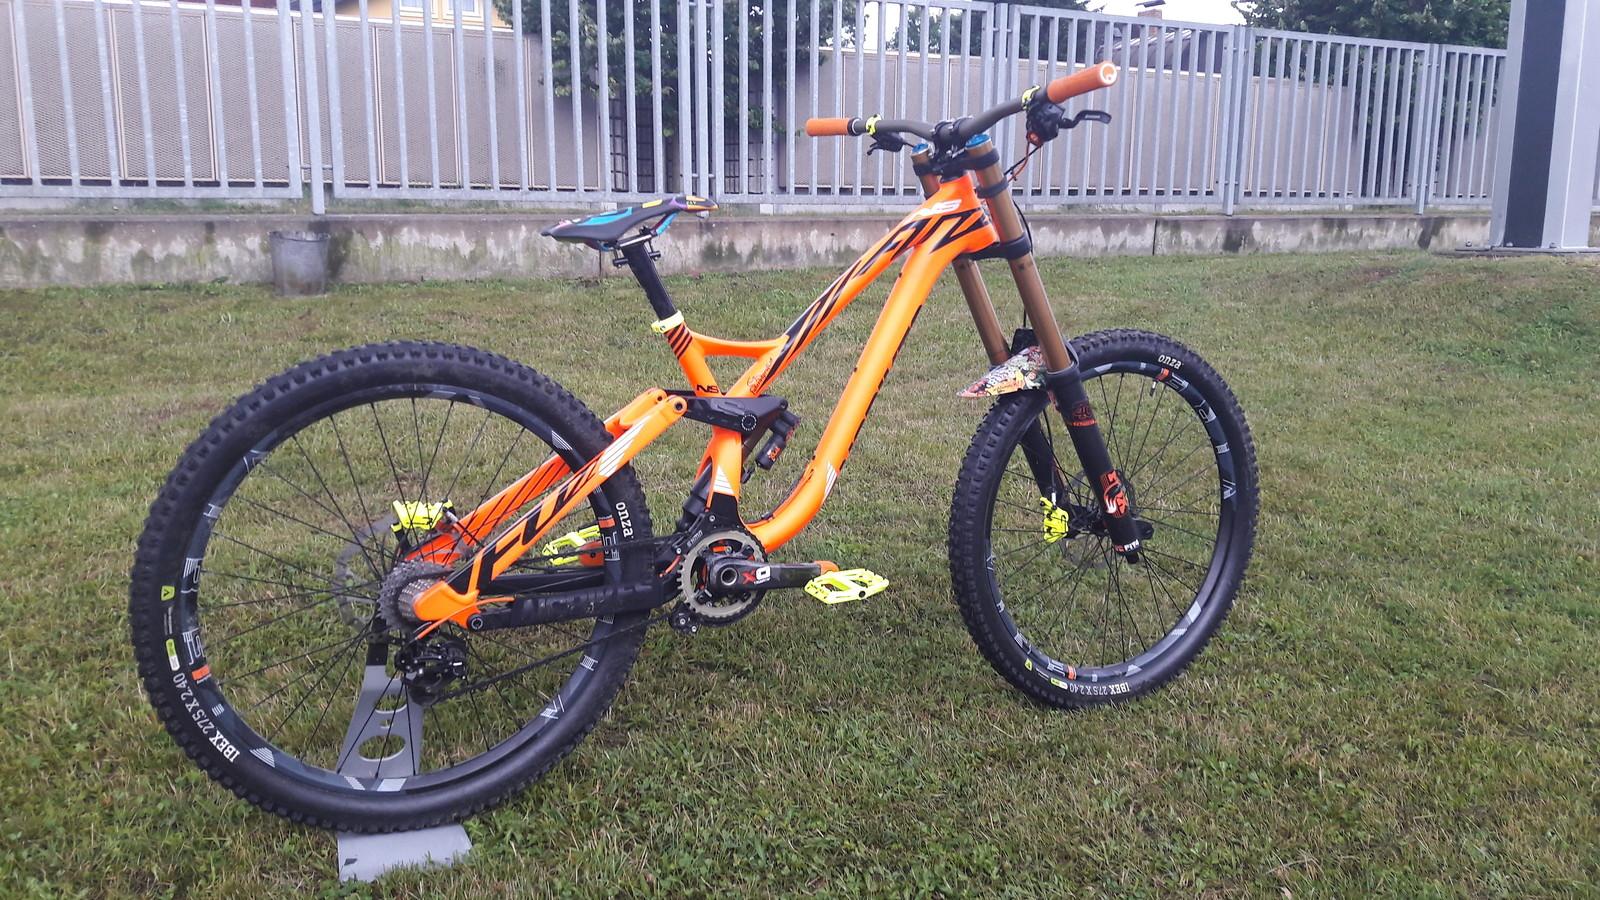 2a69332cbe5 Ns Fuzz Custom Build 2017 Makulu Alex S Bike Check Vital Mtb